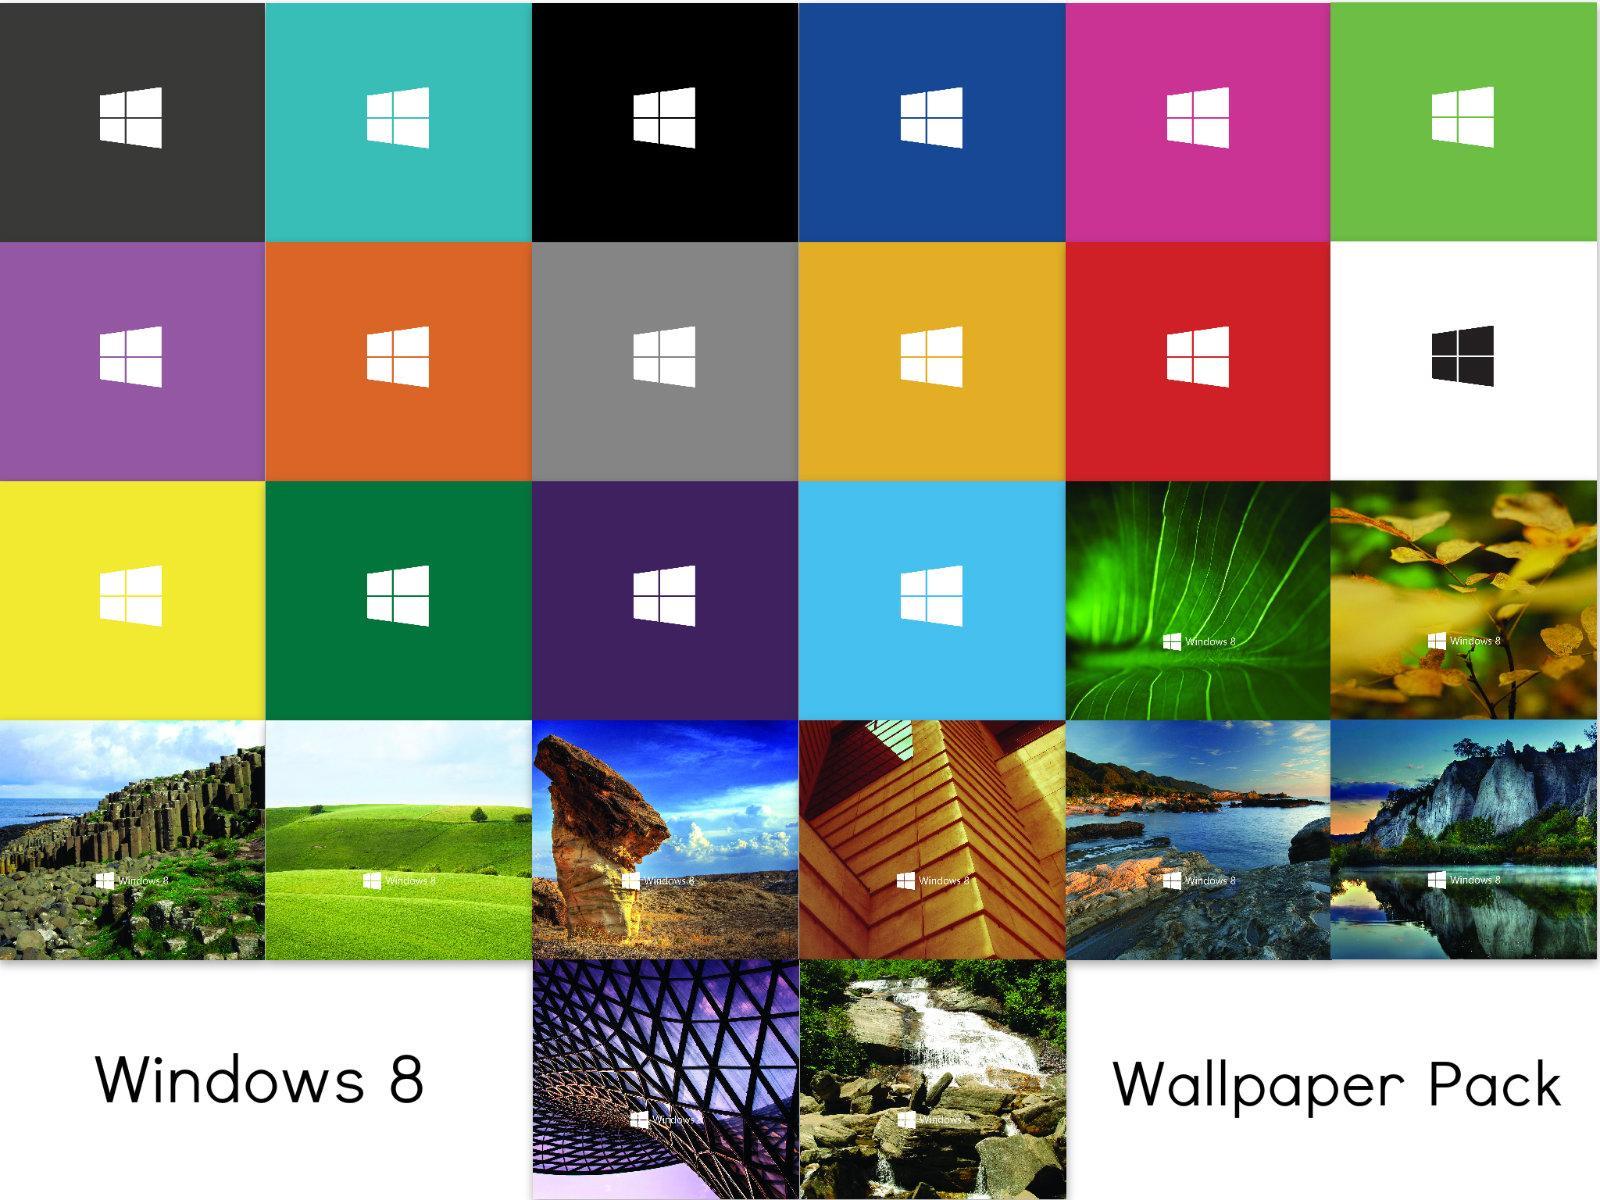 Windows 10 Wallpaper Pack: Windows 8 Photoshop Wallpapers (Updated